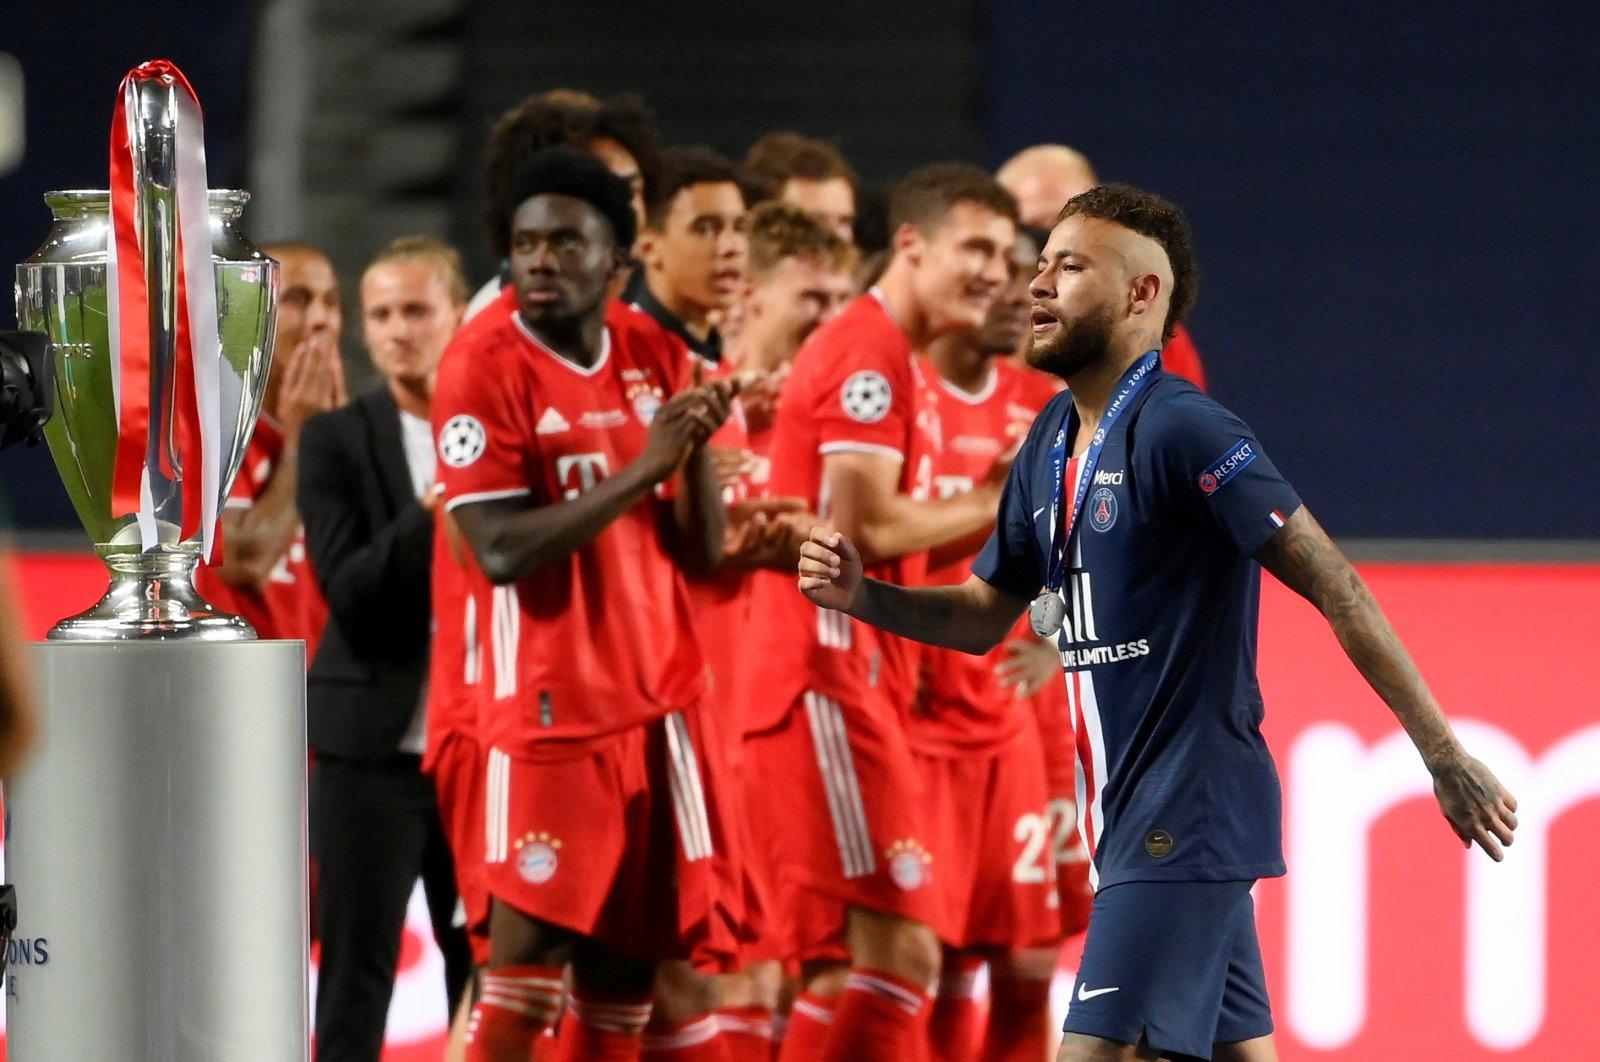 Terdapat misi balas dendam dalam pertandingan Bayern Munchen vs PSG yang dapat disaksikan secara langsung via link live streaming. (foto: Reuters)